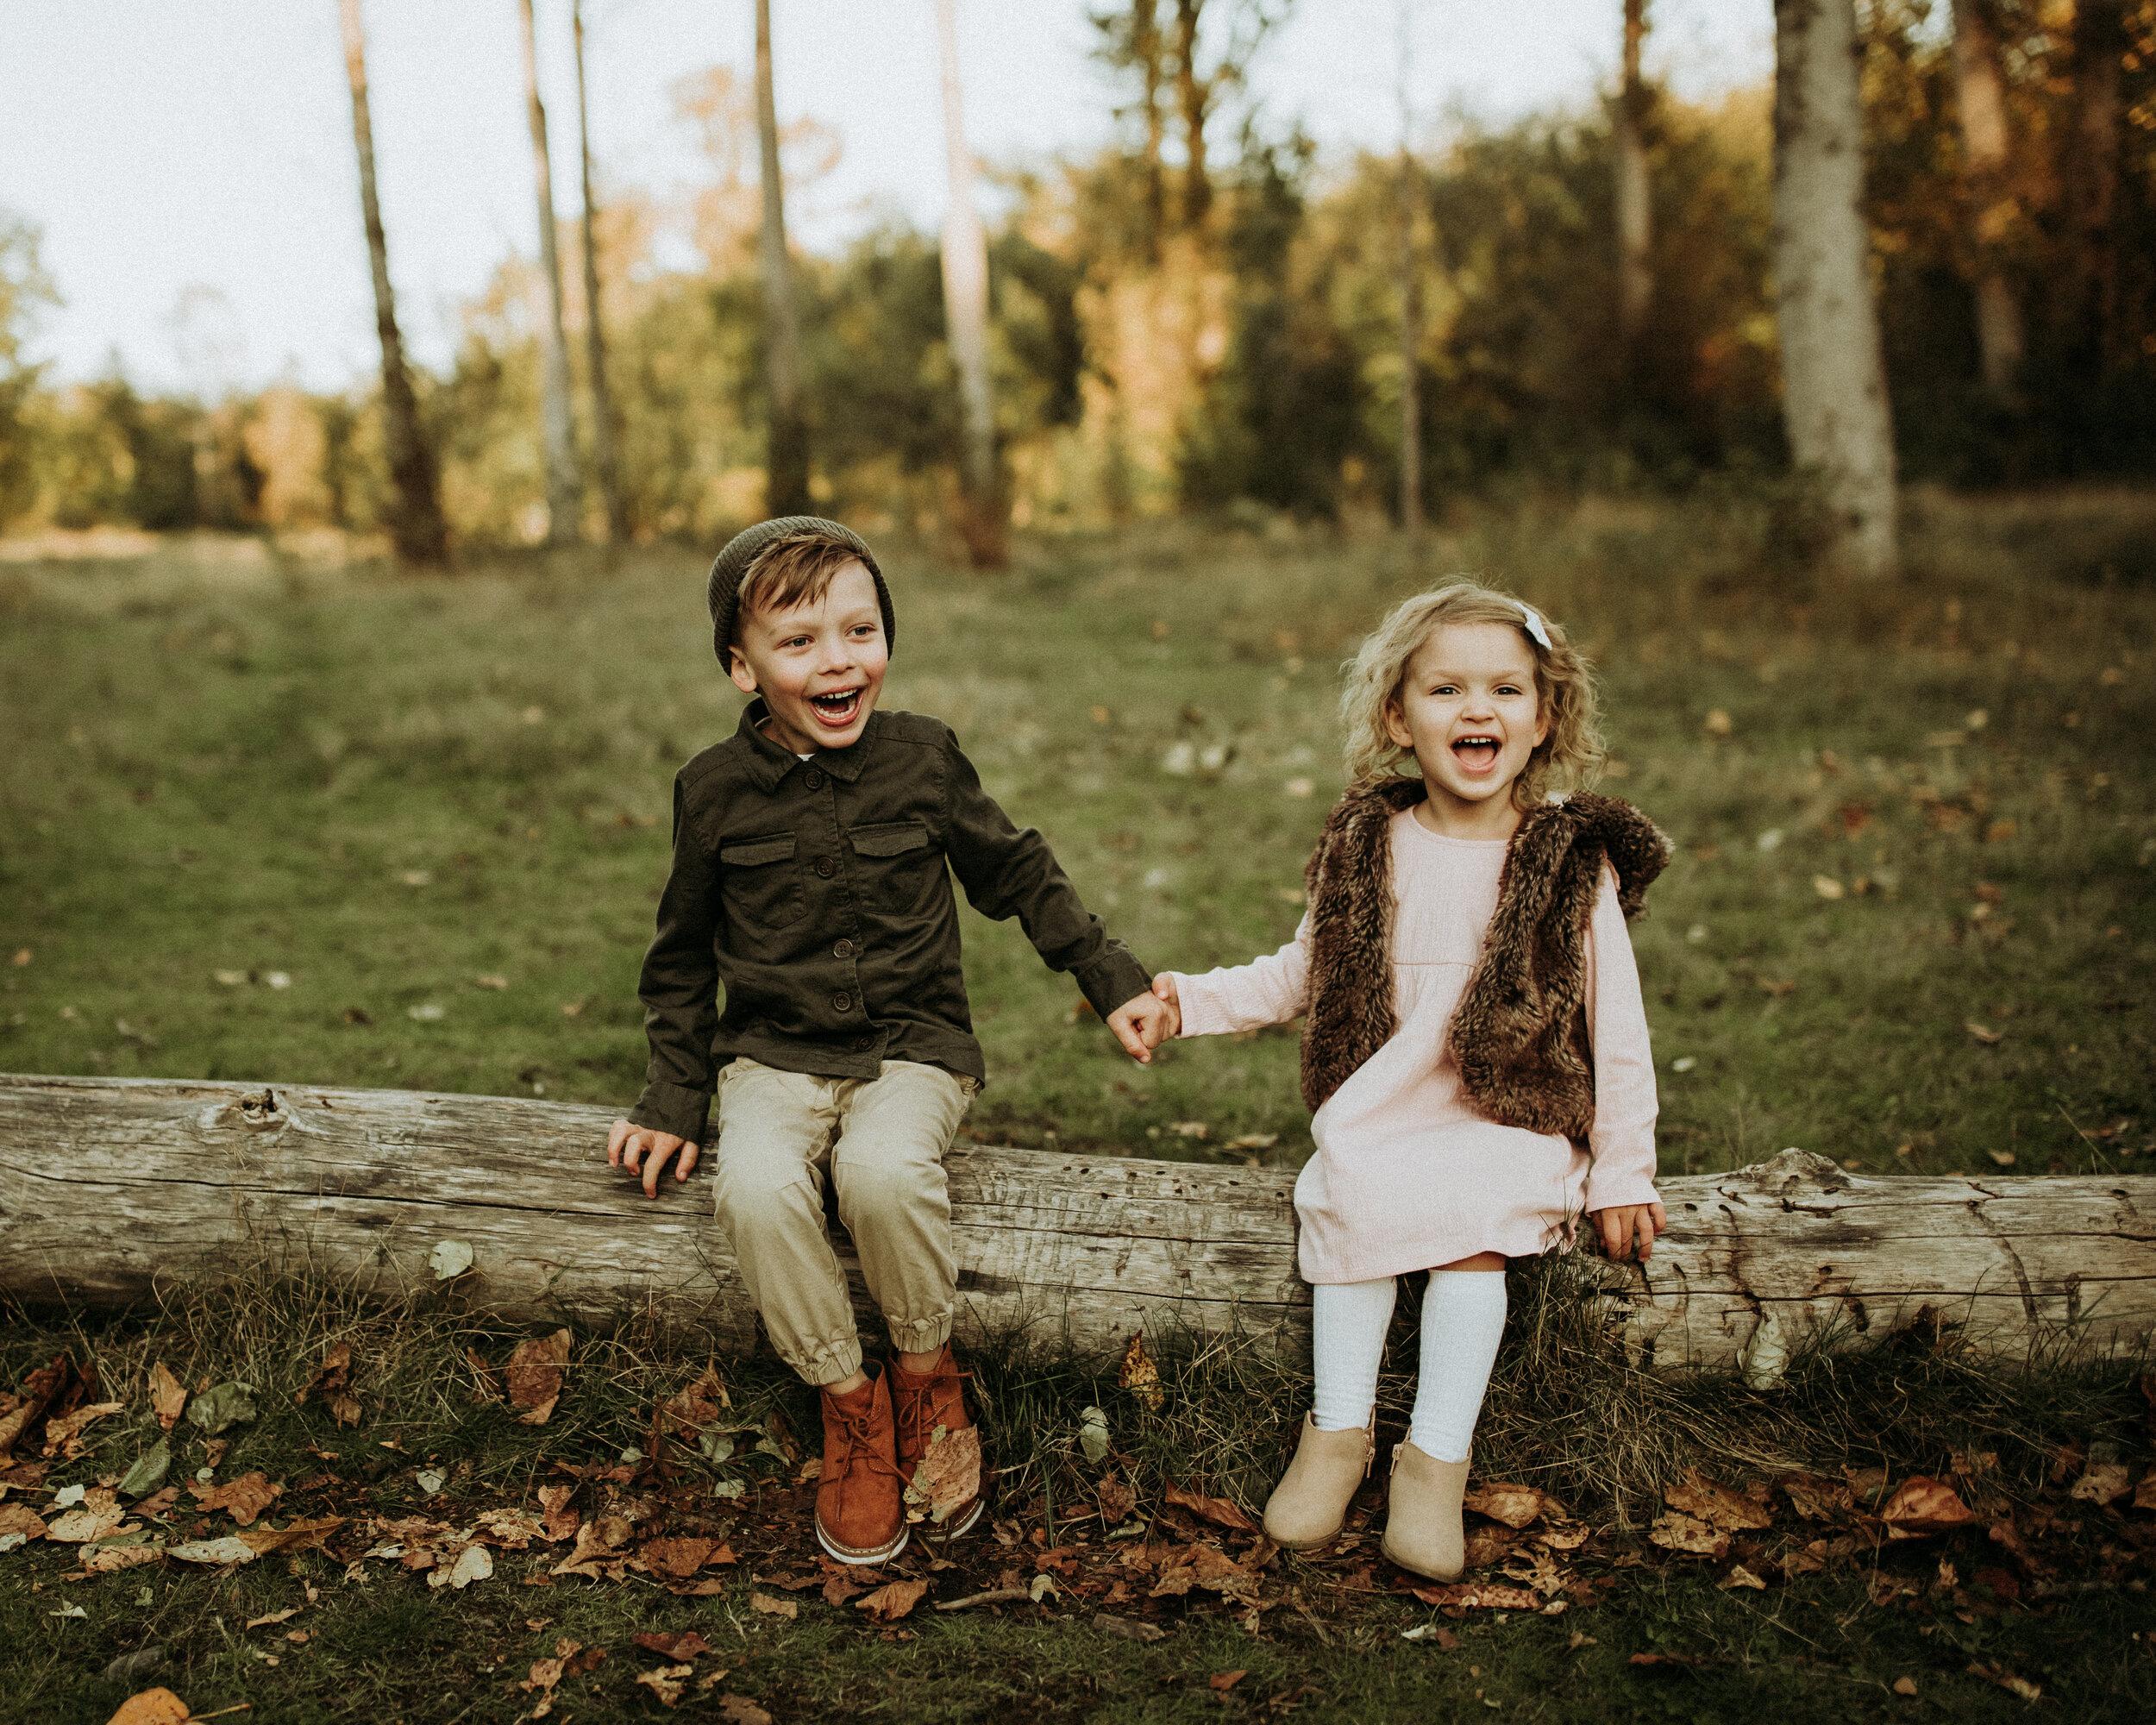 Family-Photographer-Bellingham-WA-Brianne-Bell-Photography-(Miller) (4 of 12).jpg